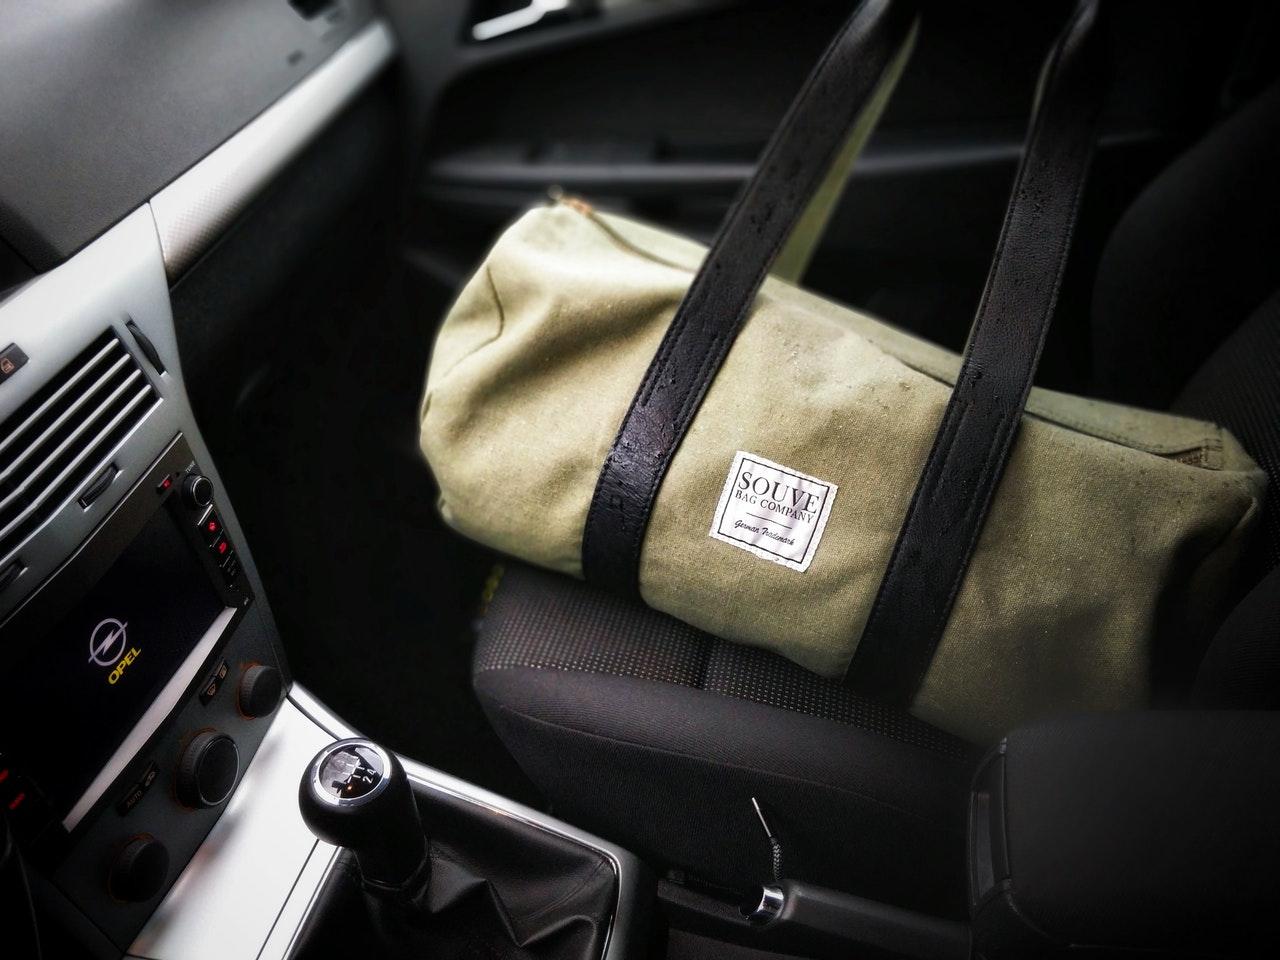 duffle bag in a car